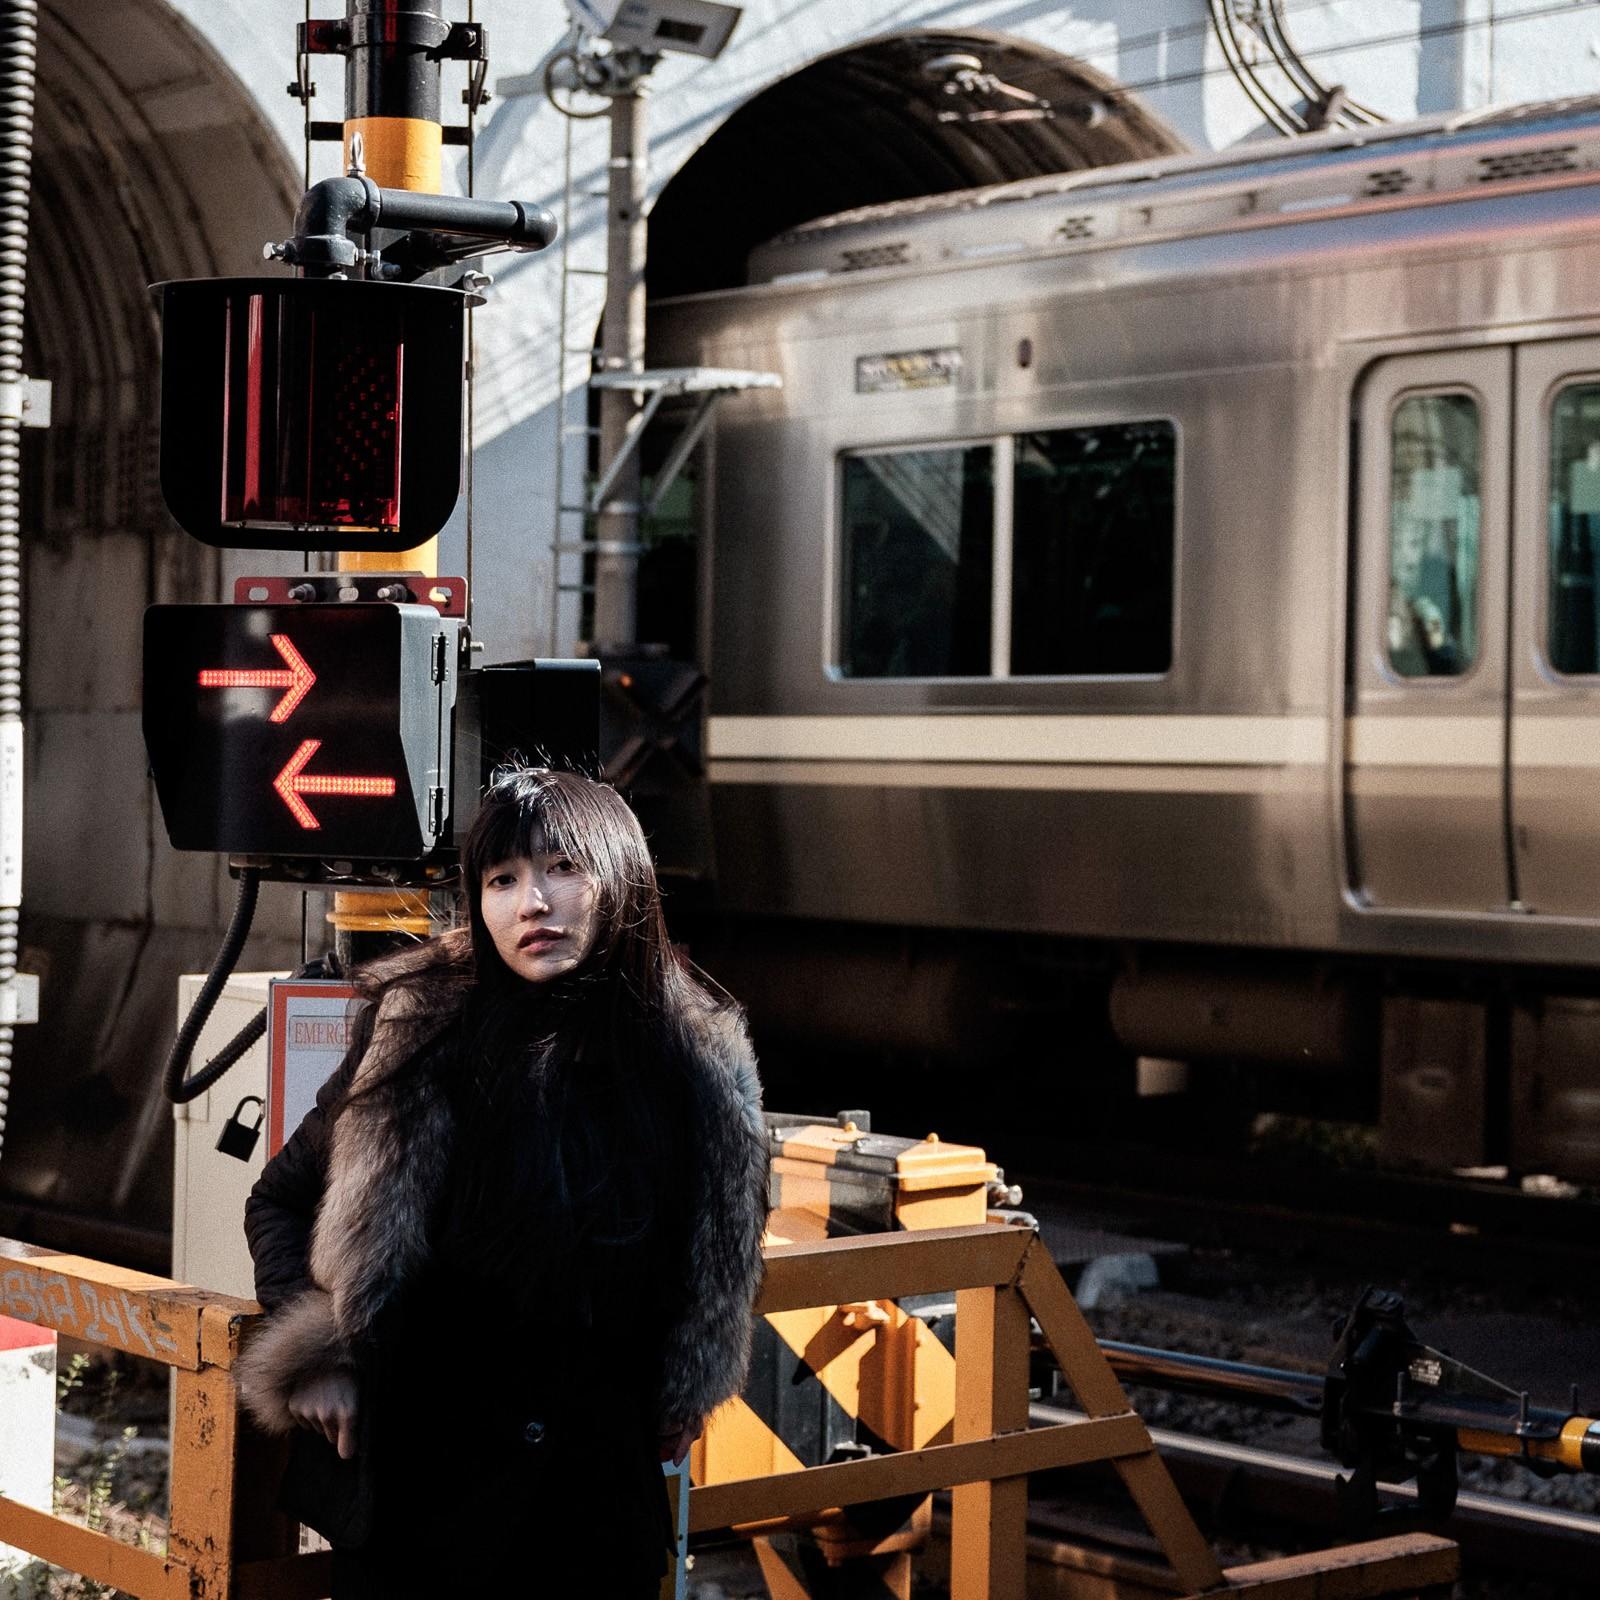 japanese woman posing at shinsen sation in tokyo